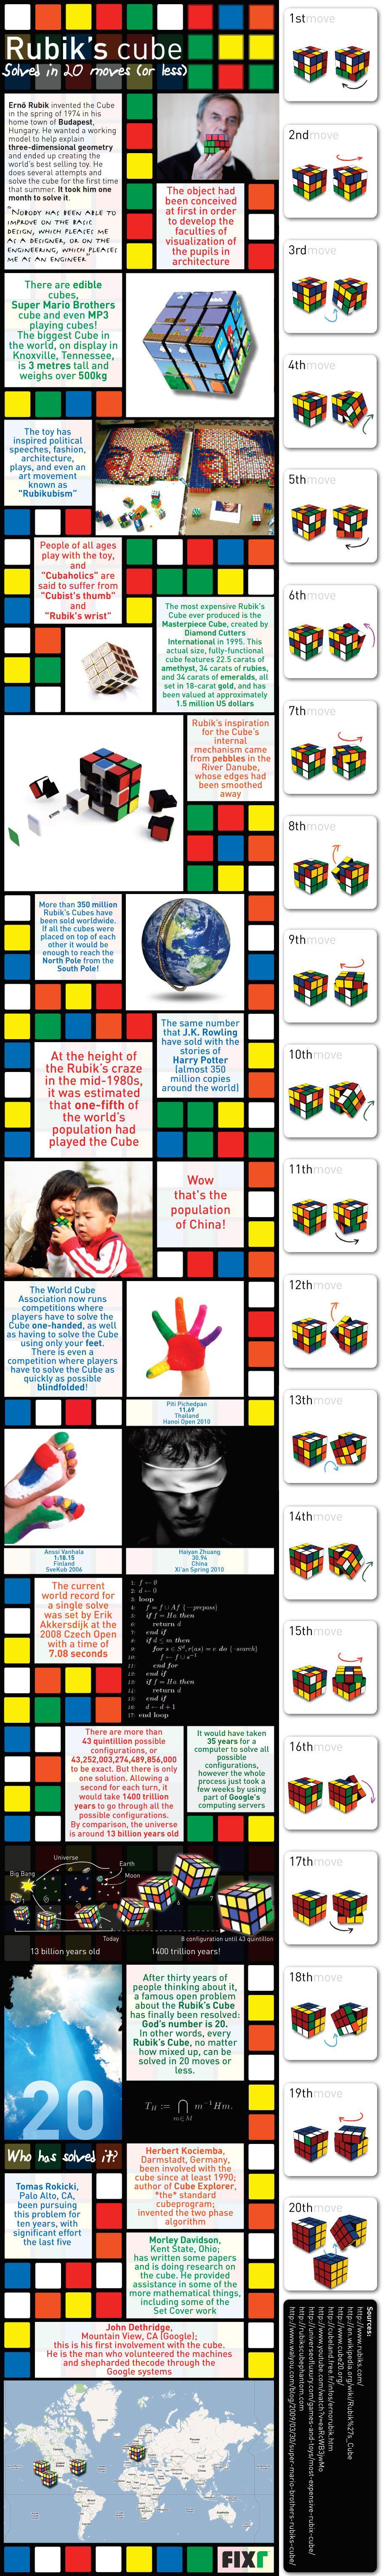 The Rubik S Cube Rubik S Cube Solve Fun Facts Cube